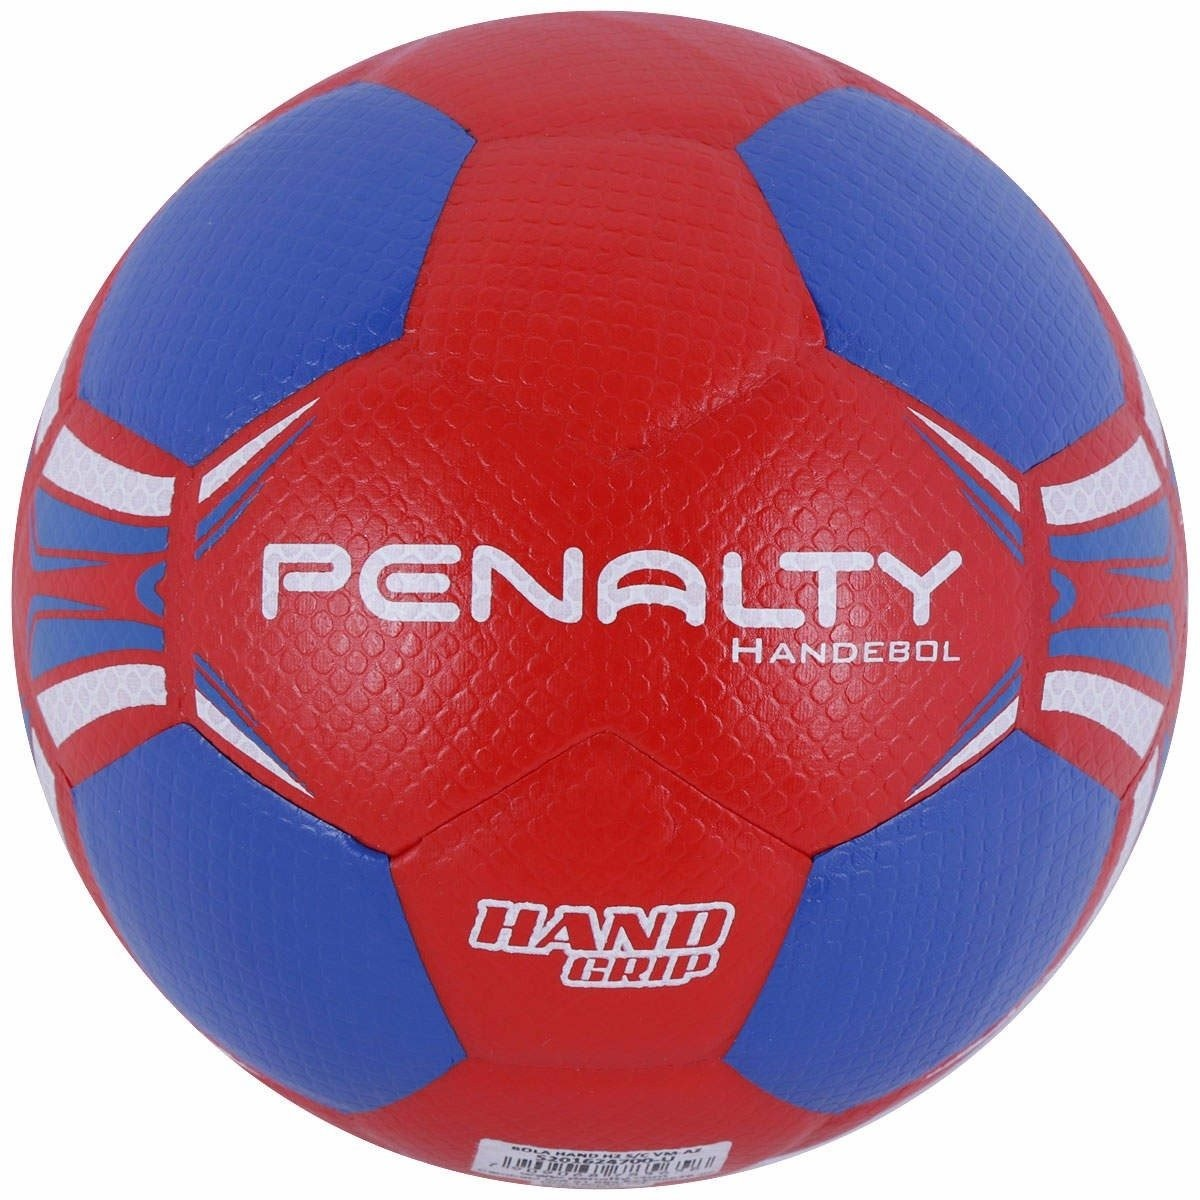 72e26fea758c2 Bola Handebol Penalty H3l Ultra Fusion Vii - Masculino - R  106